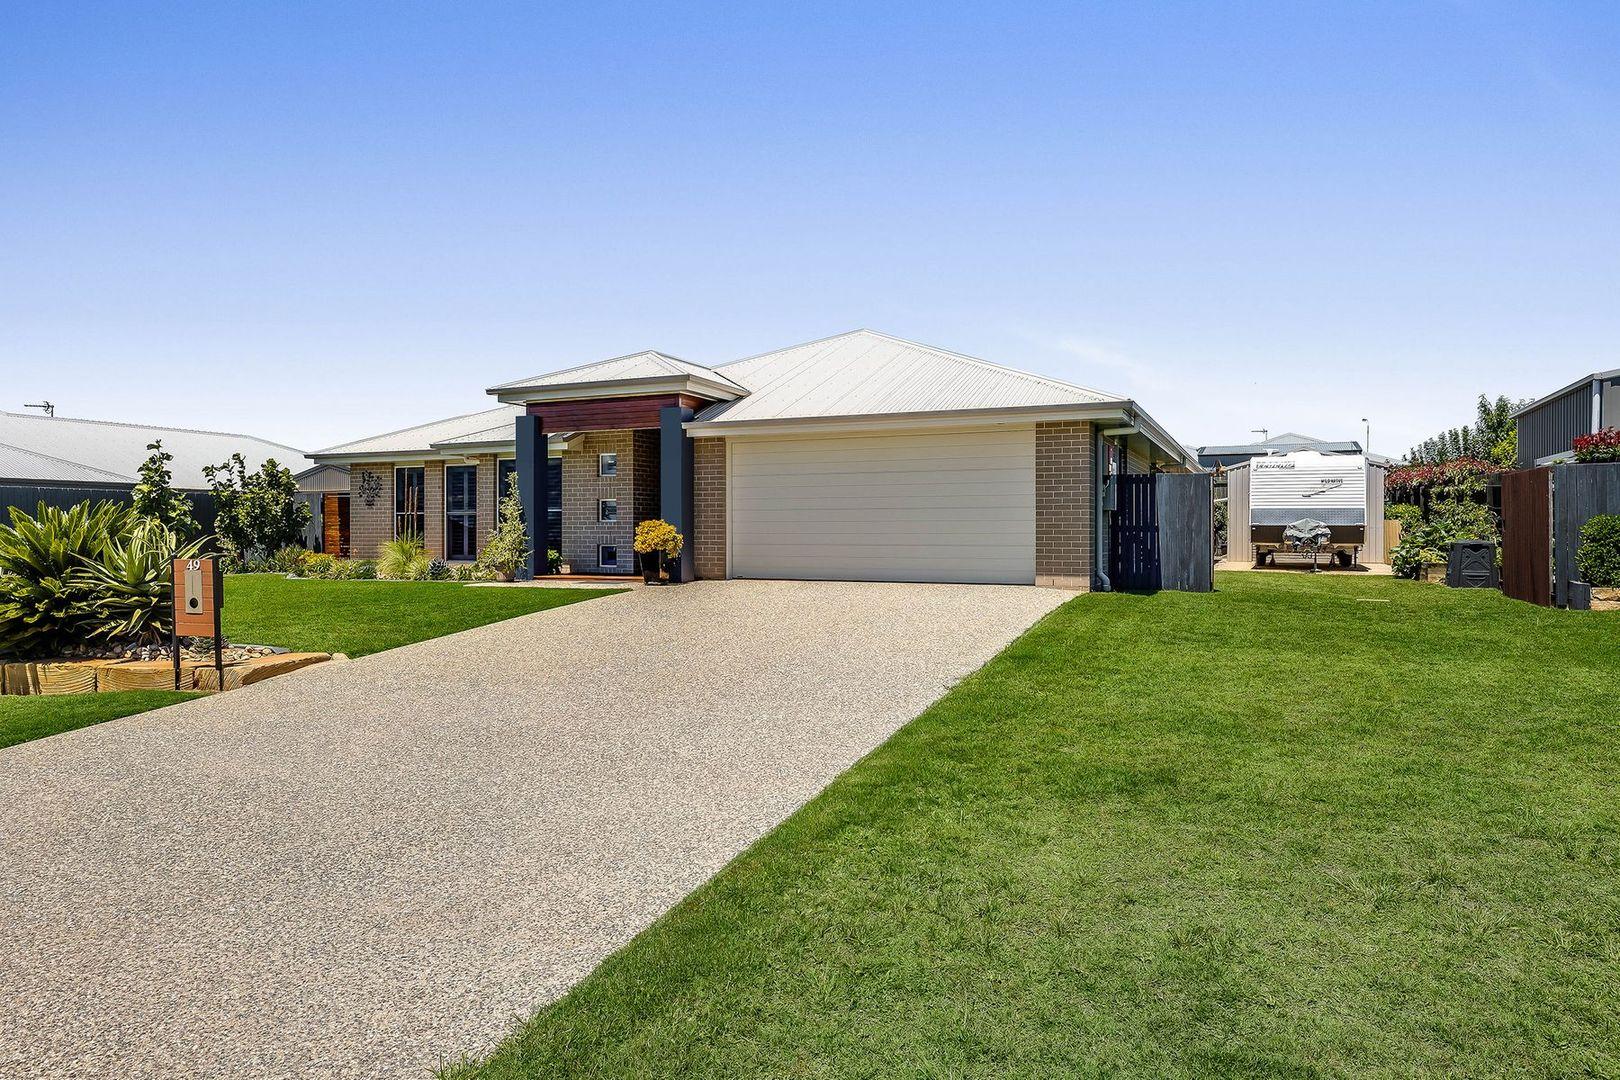 49 Kalimna Drive, Kleinton QLD 4352, Image 2